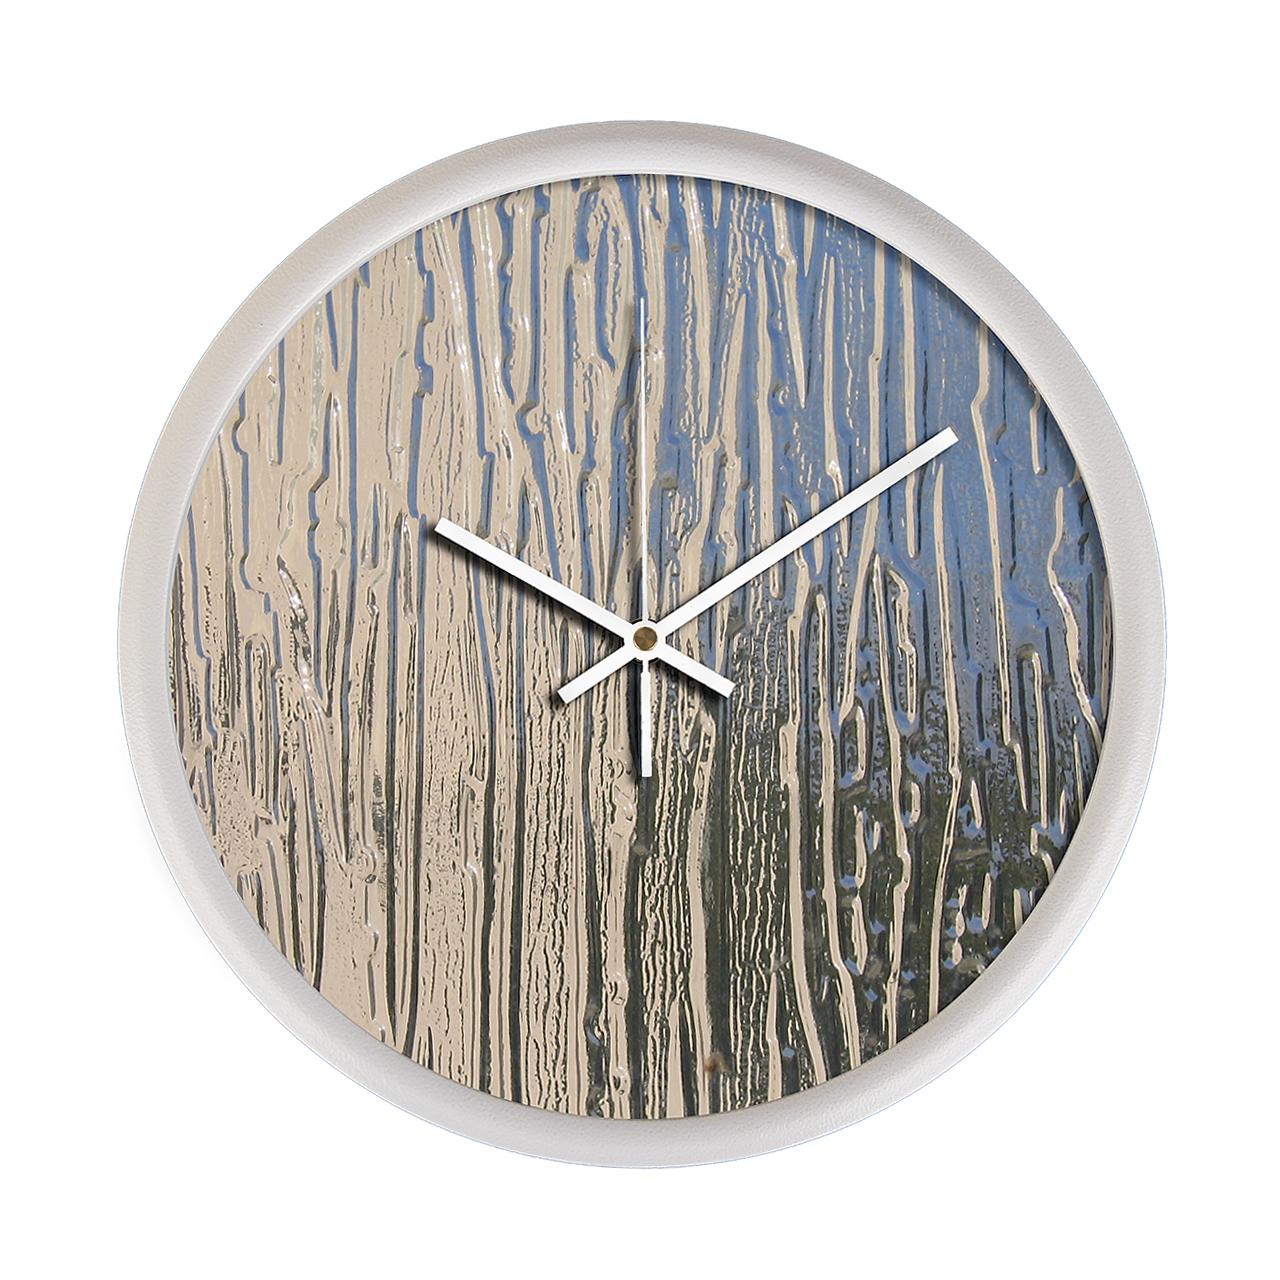 ساعت دیواری مینی مال لاکچری مدل 35Dio3_0194